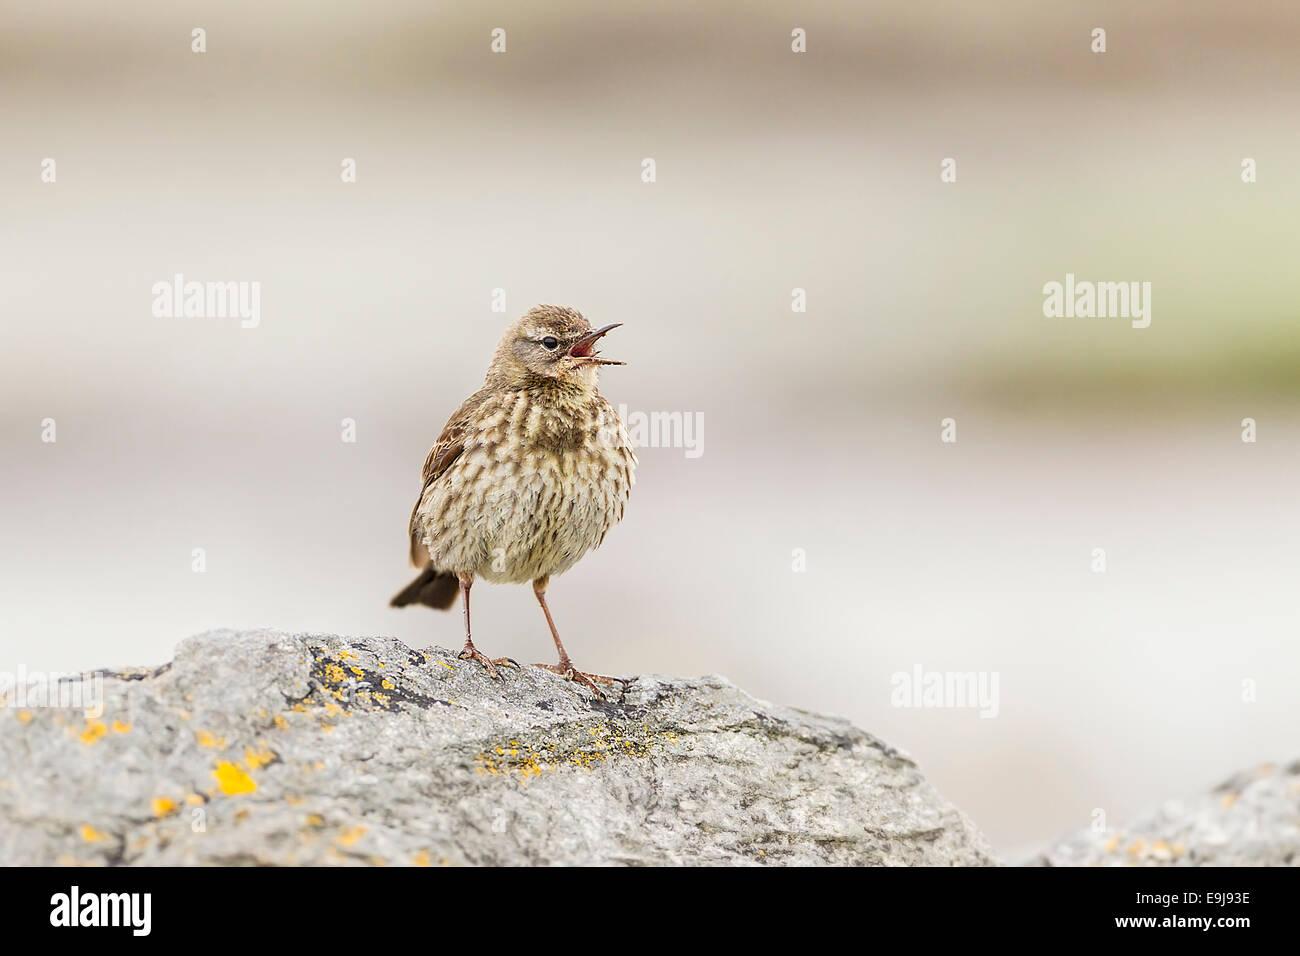 Rock Pipit (Anthus petrosus) - Stock Image